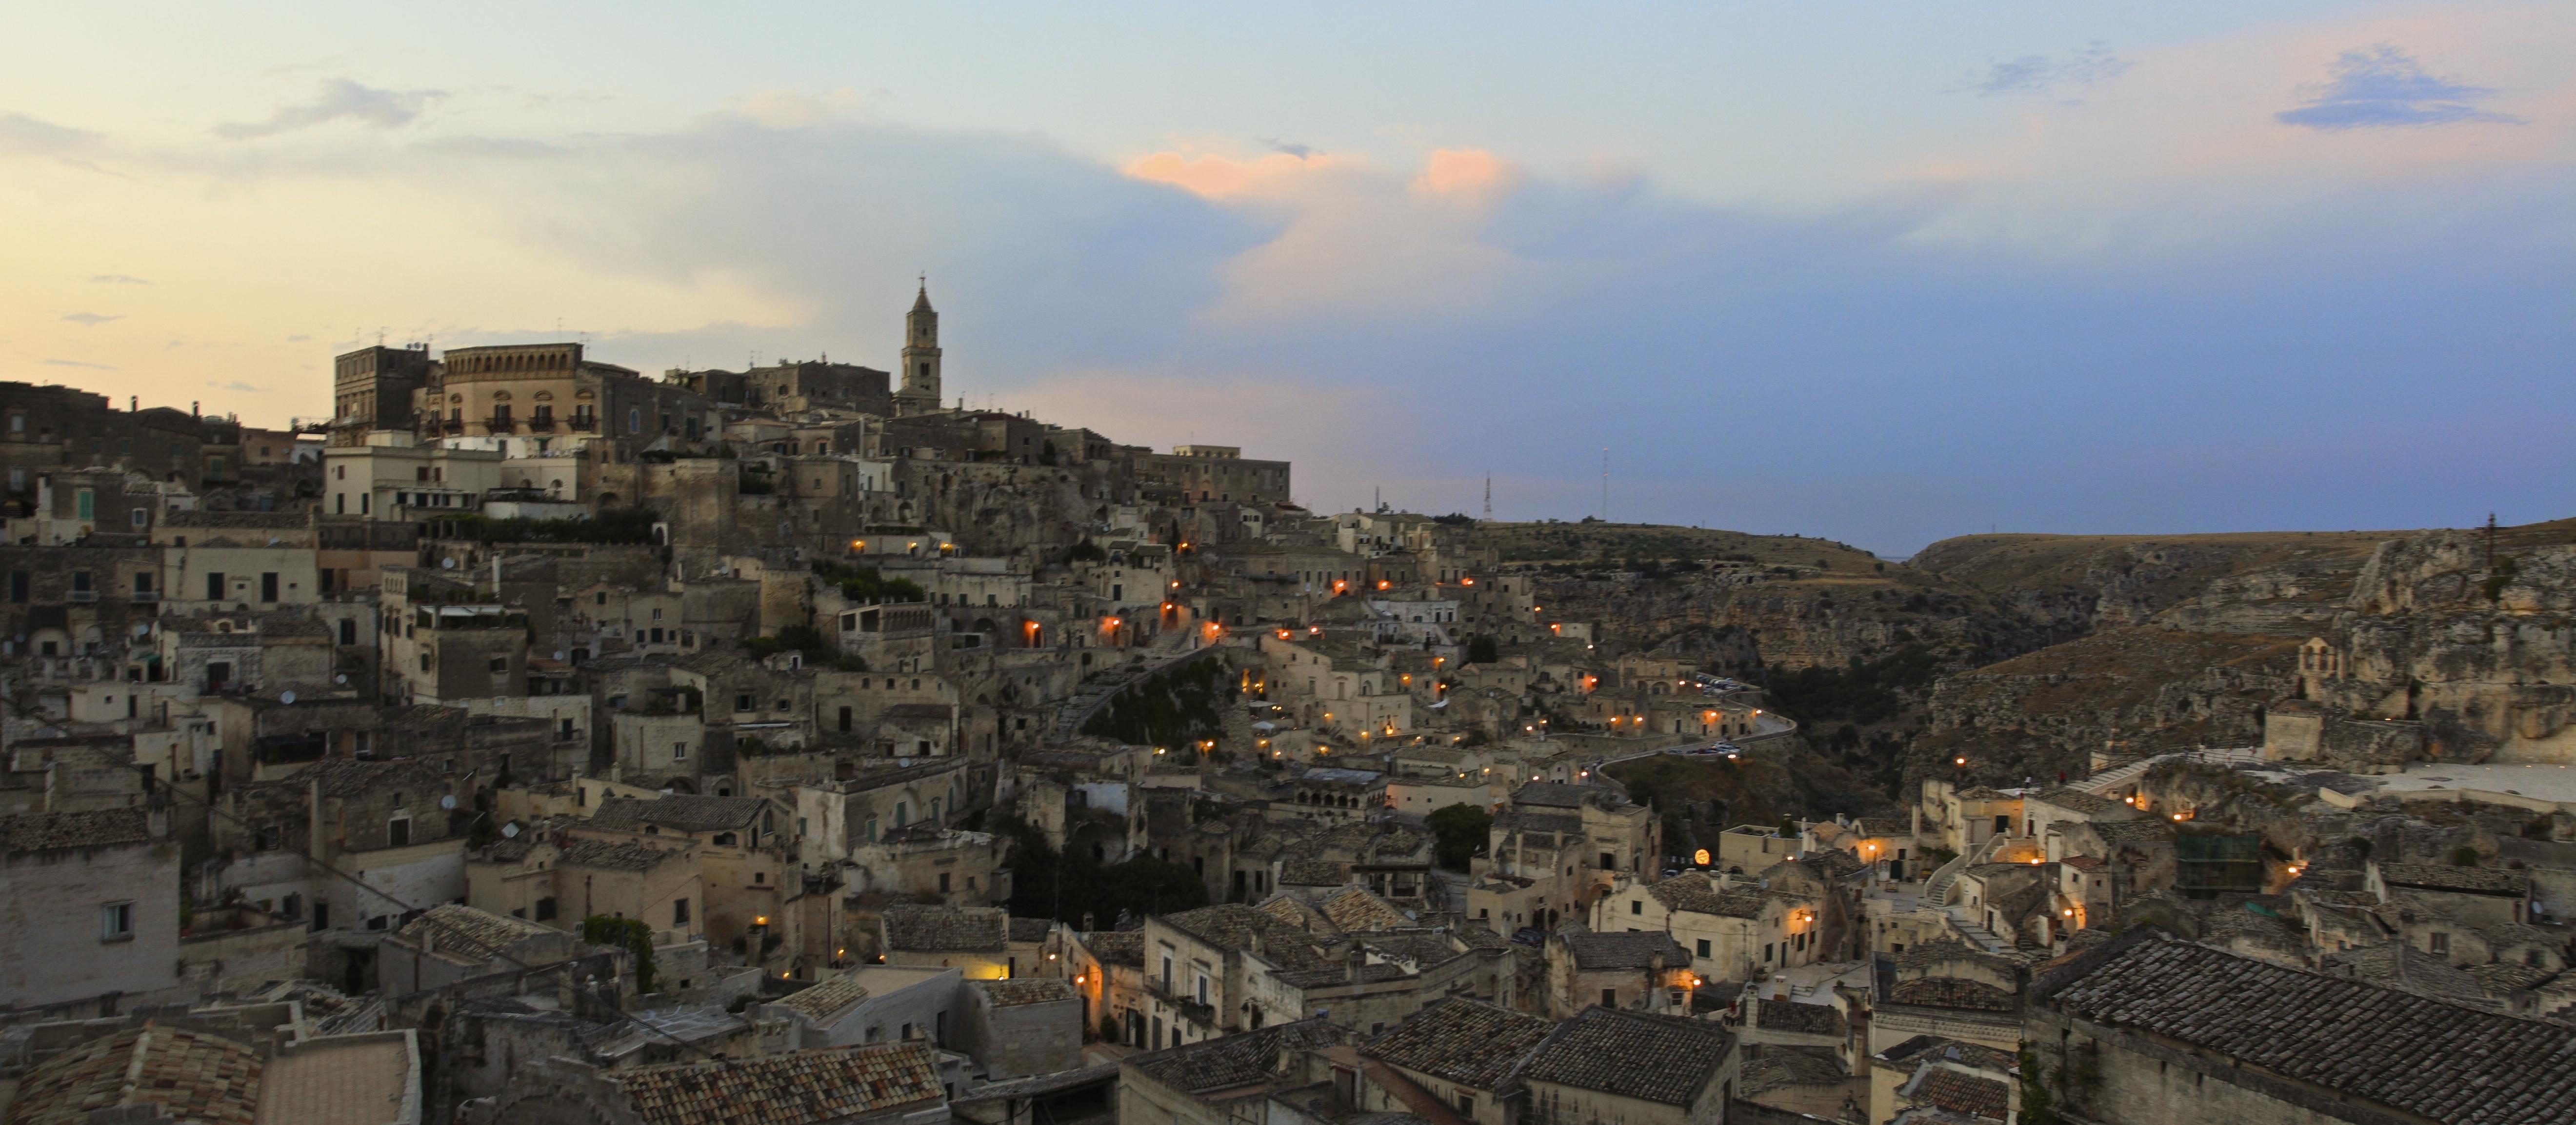 Panoramica dei Sassi di Matera